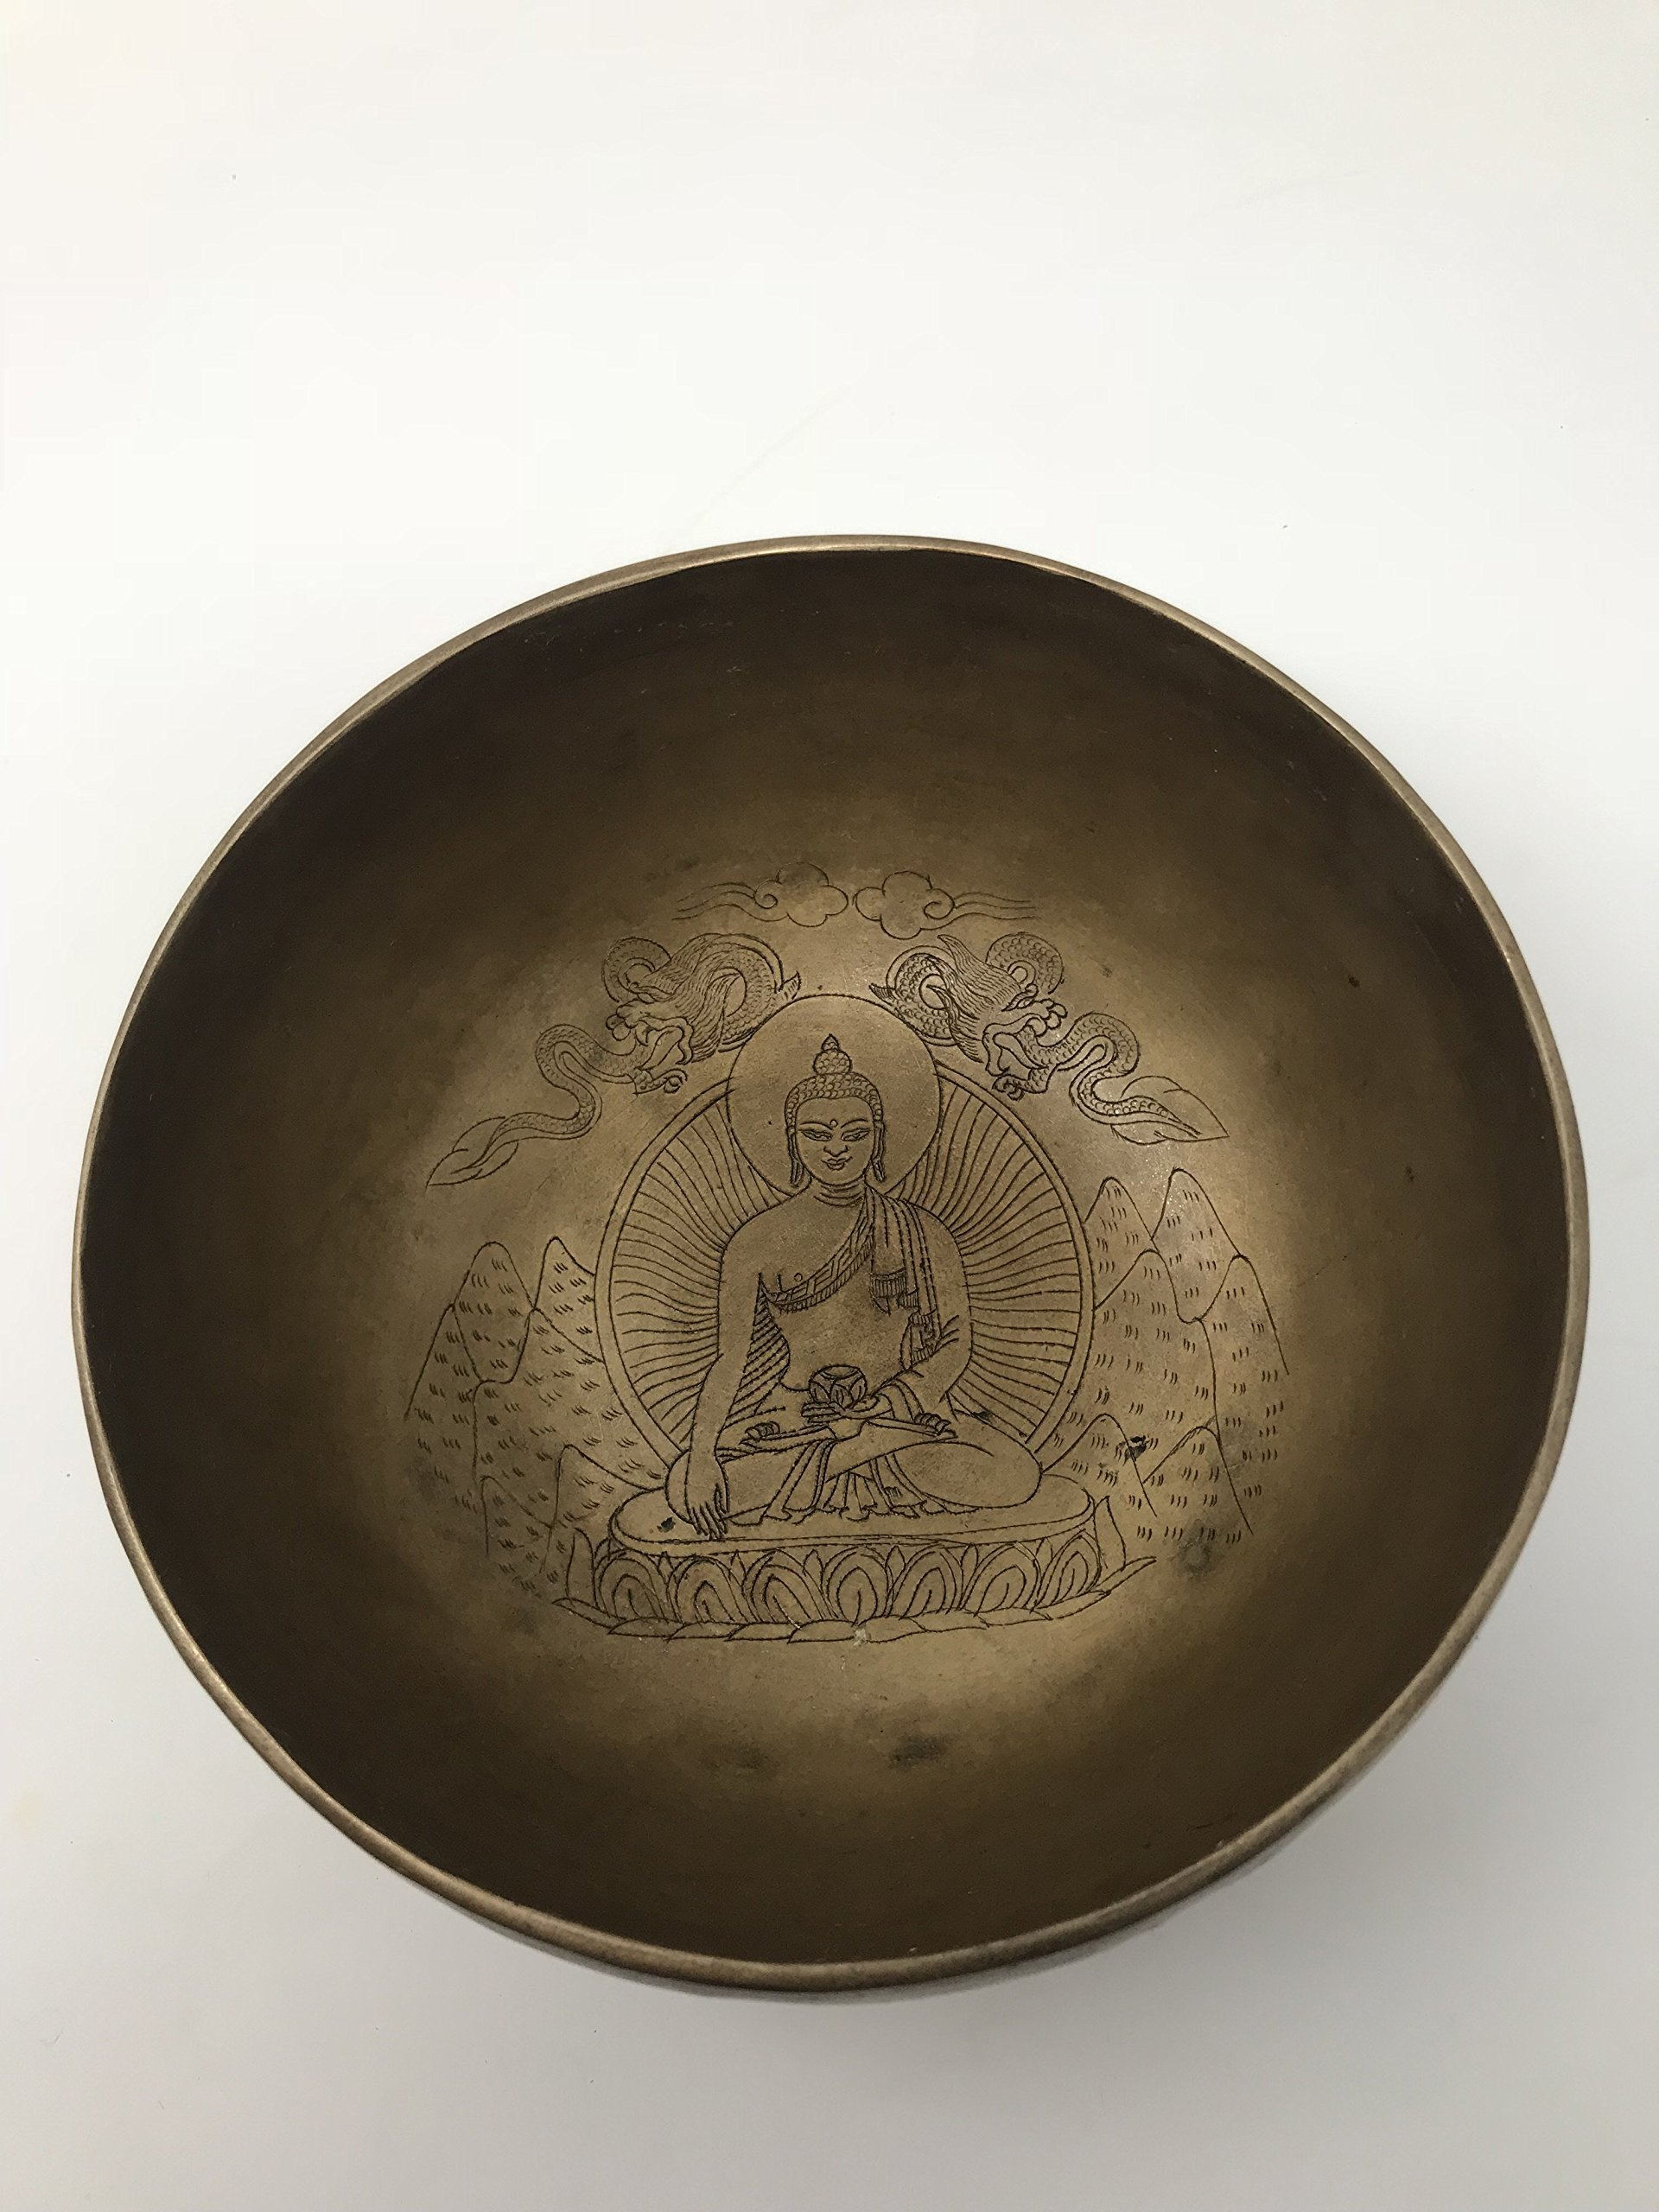 Buddha Tibetan Meditation Hand Hammered Singing Bowl. ~ Nepalese crafsmanship - Hills, Dragons, Halo, Buddha by Nepal Soul